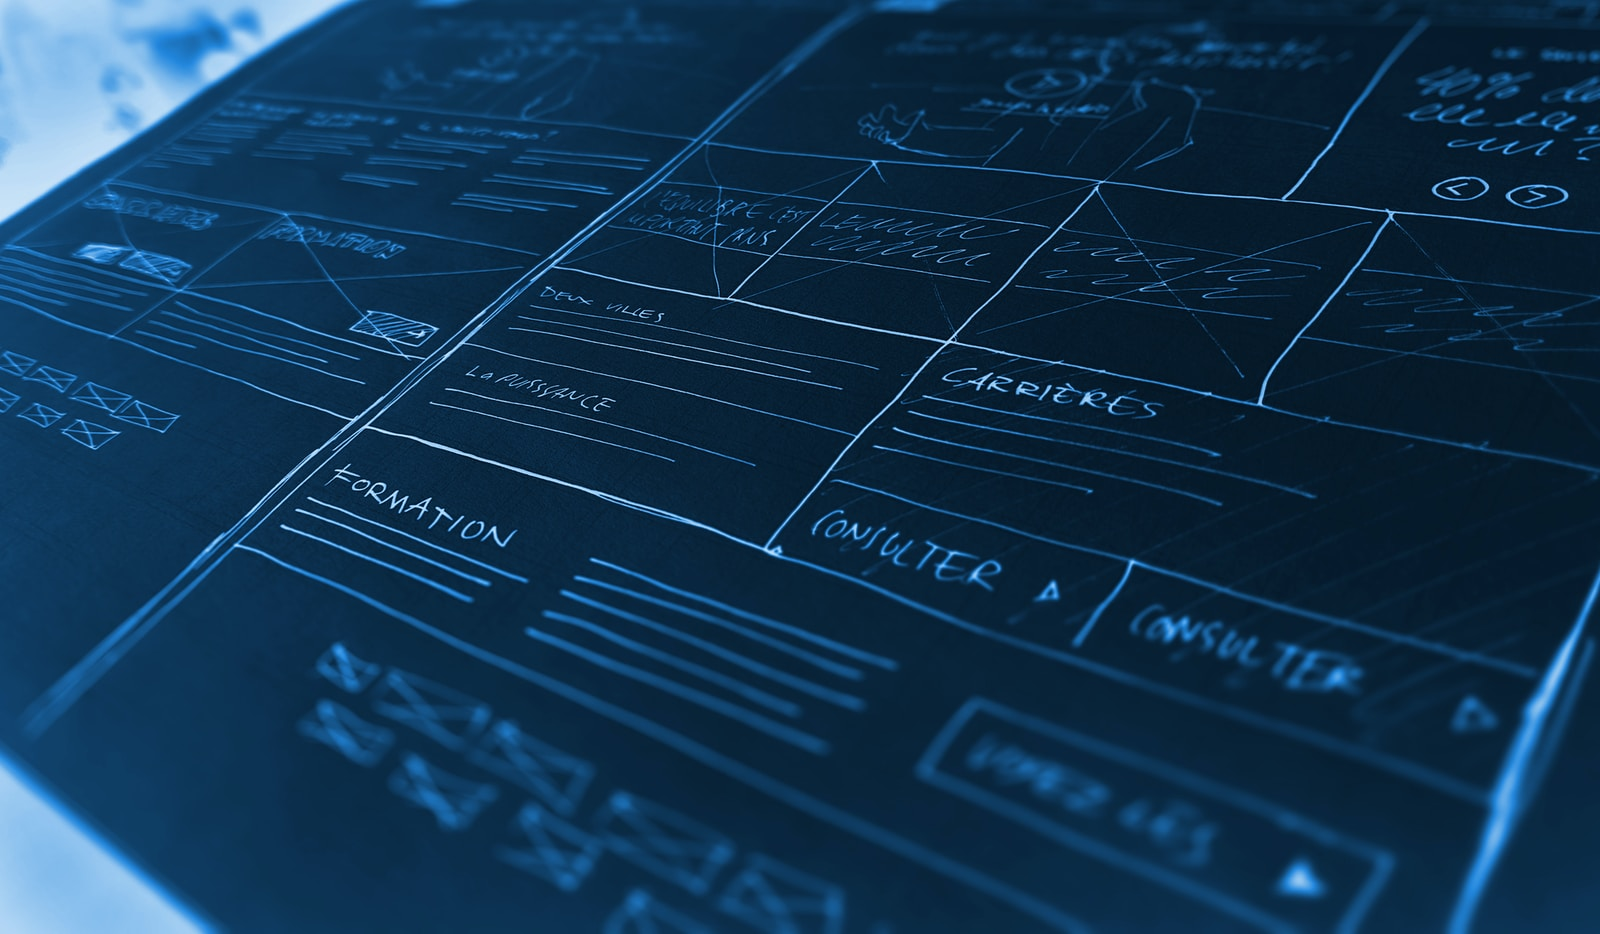 blueprints for a house